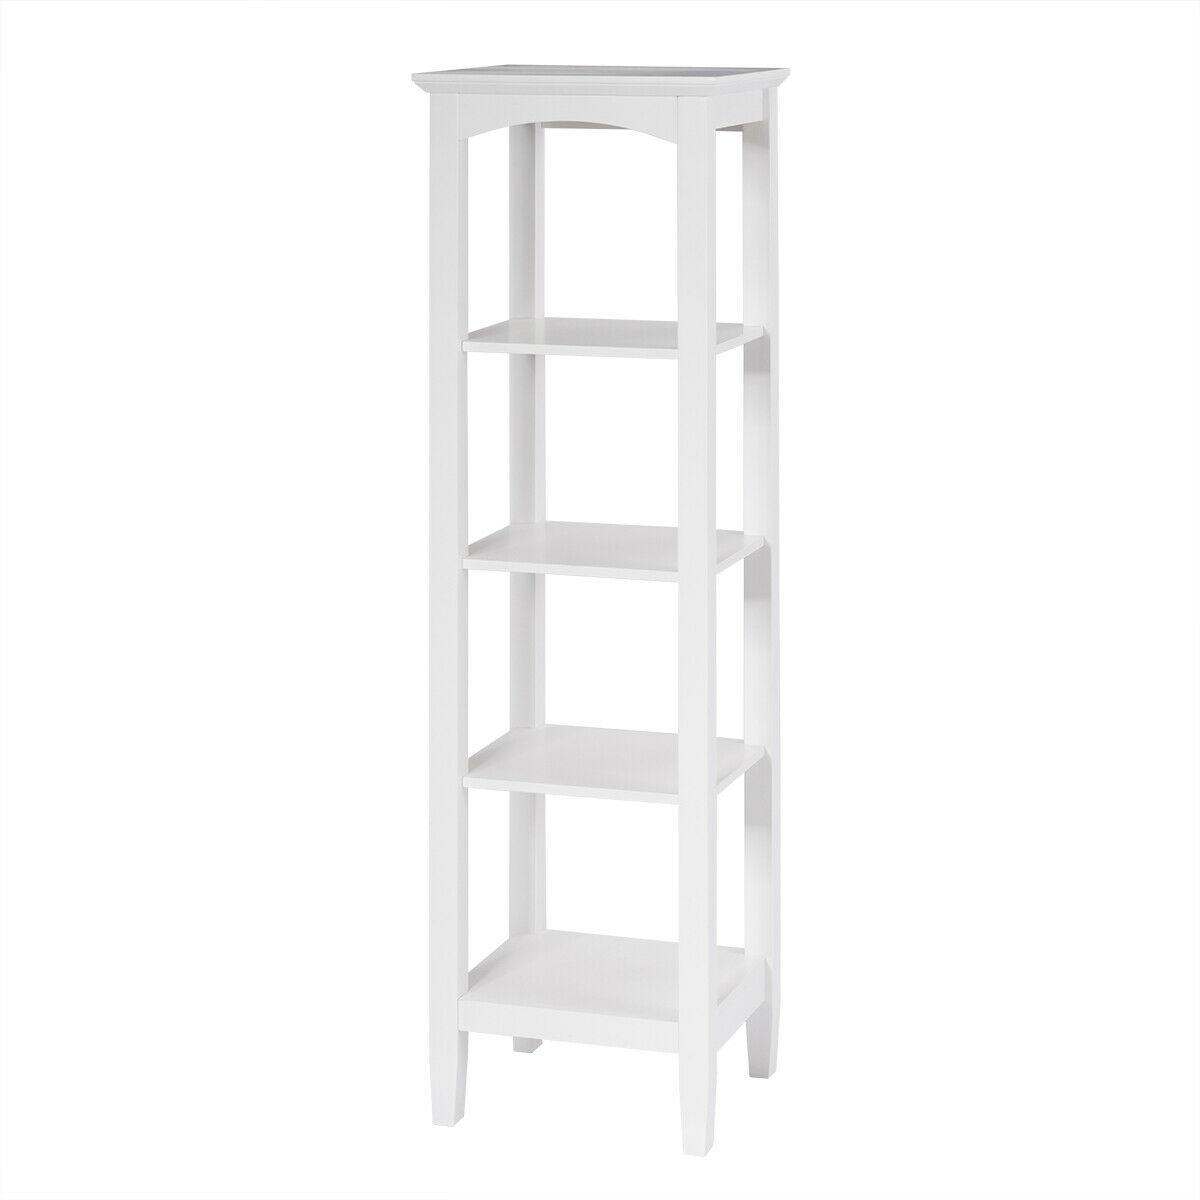 5-Tier Utility Shelves Storage Rack Multifunctional Freestanding Shelving Unit